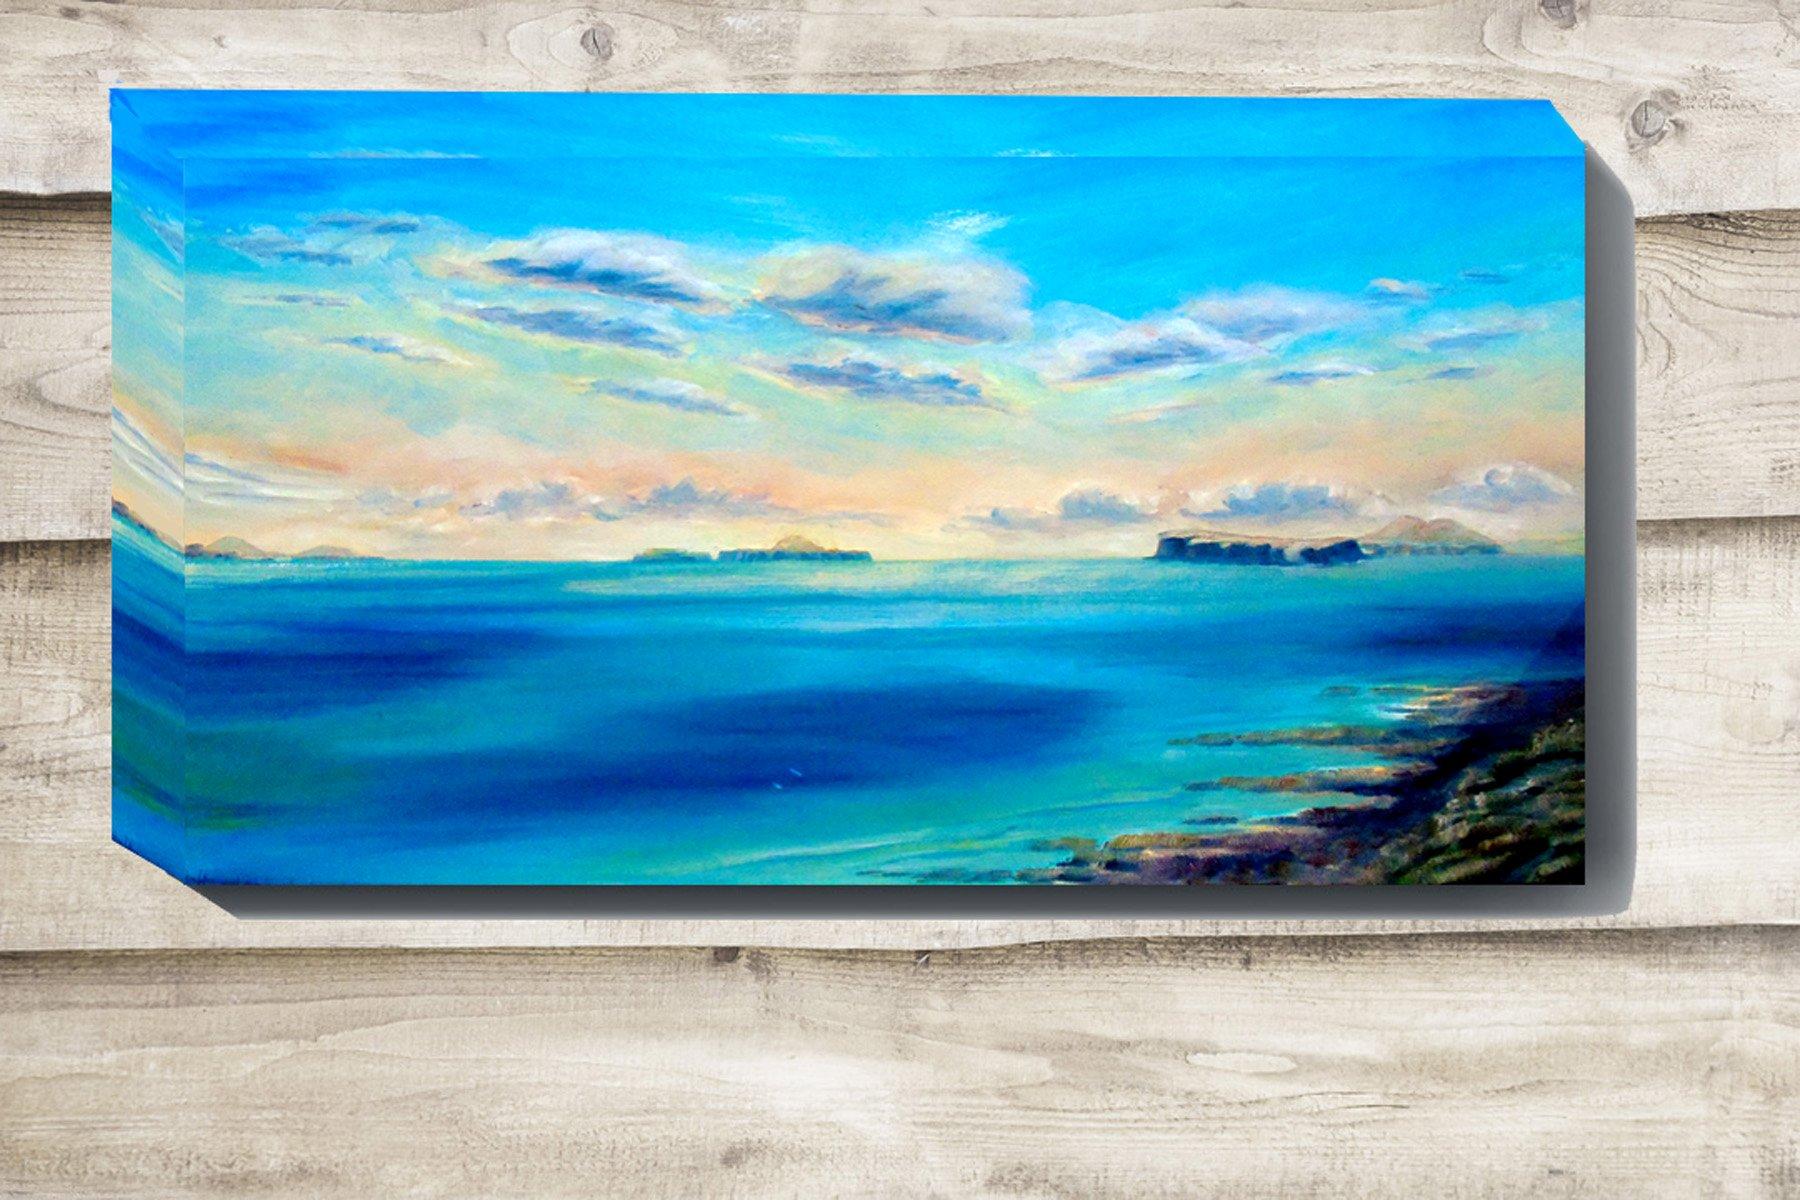 Treshnish Isles painting on canvas